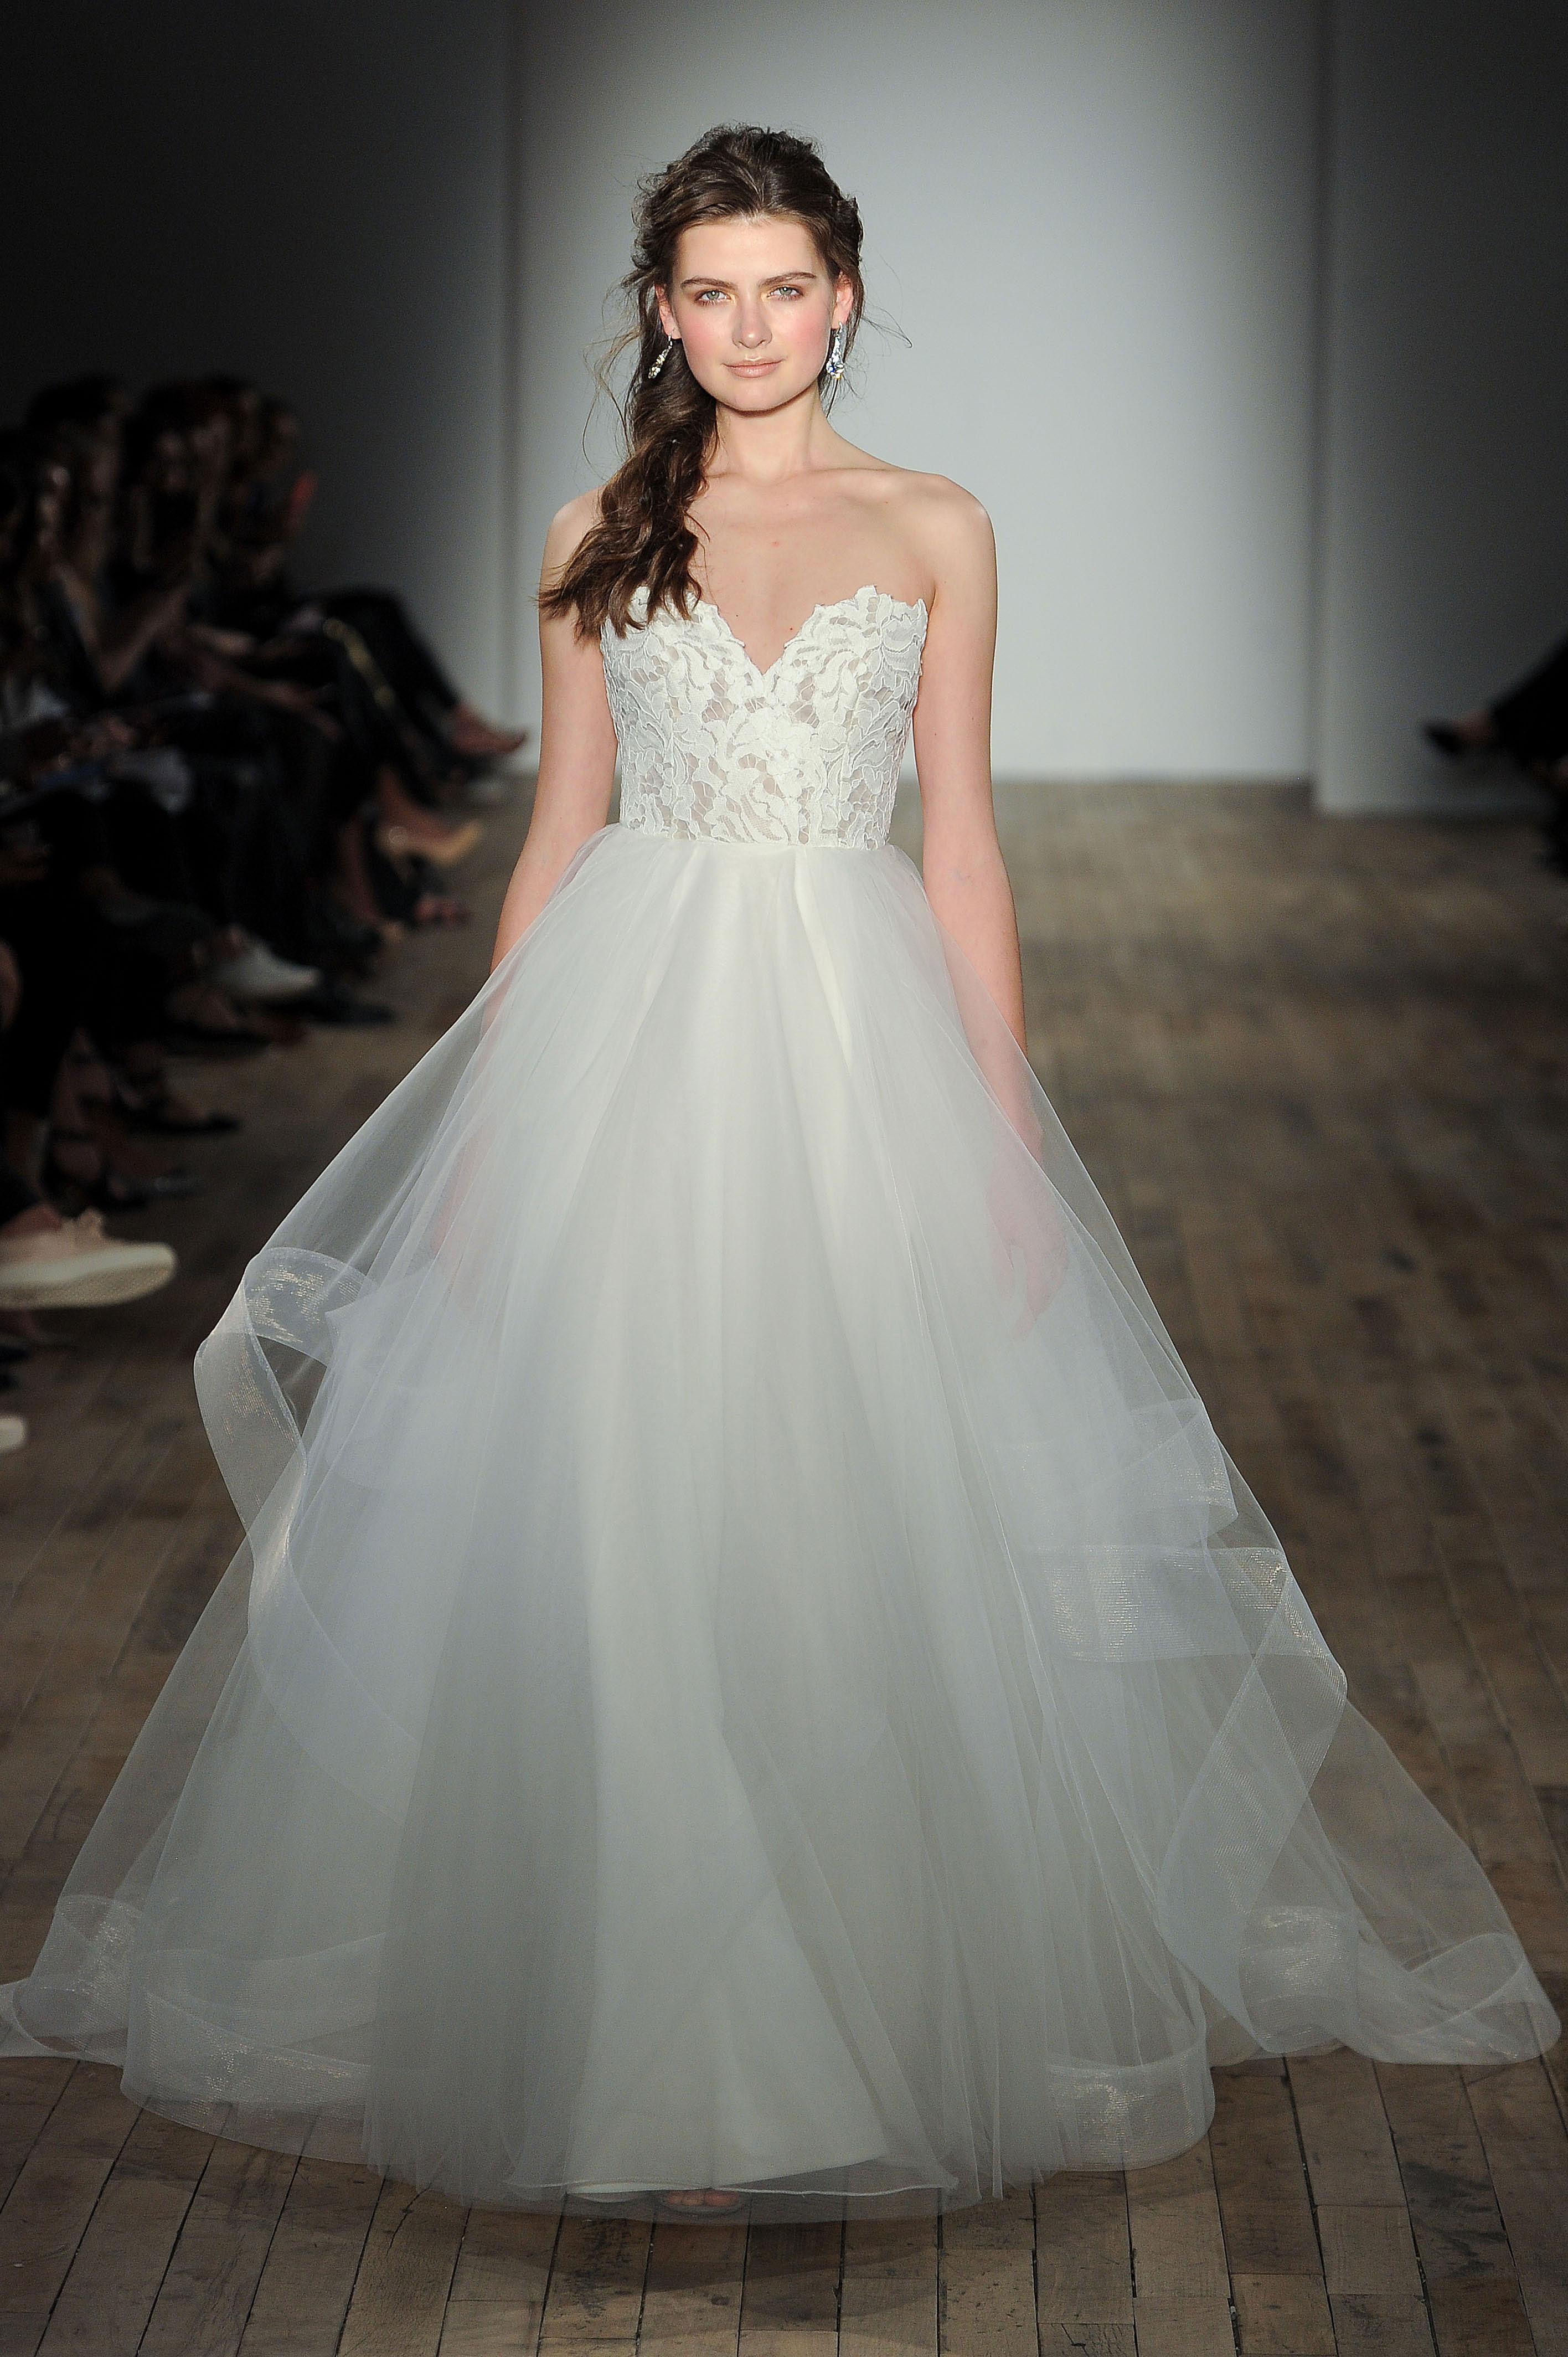 blush by hayley paige v-neck wedding dress spring 2018